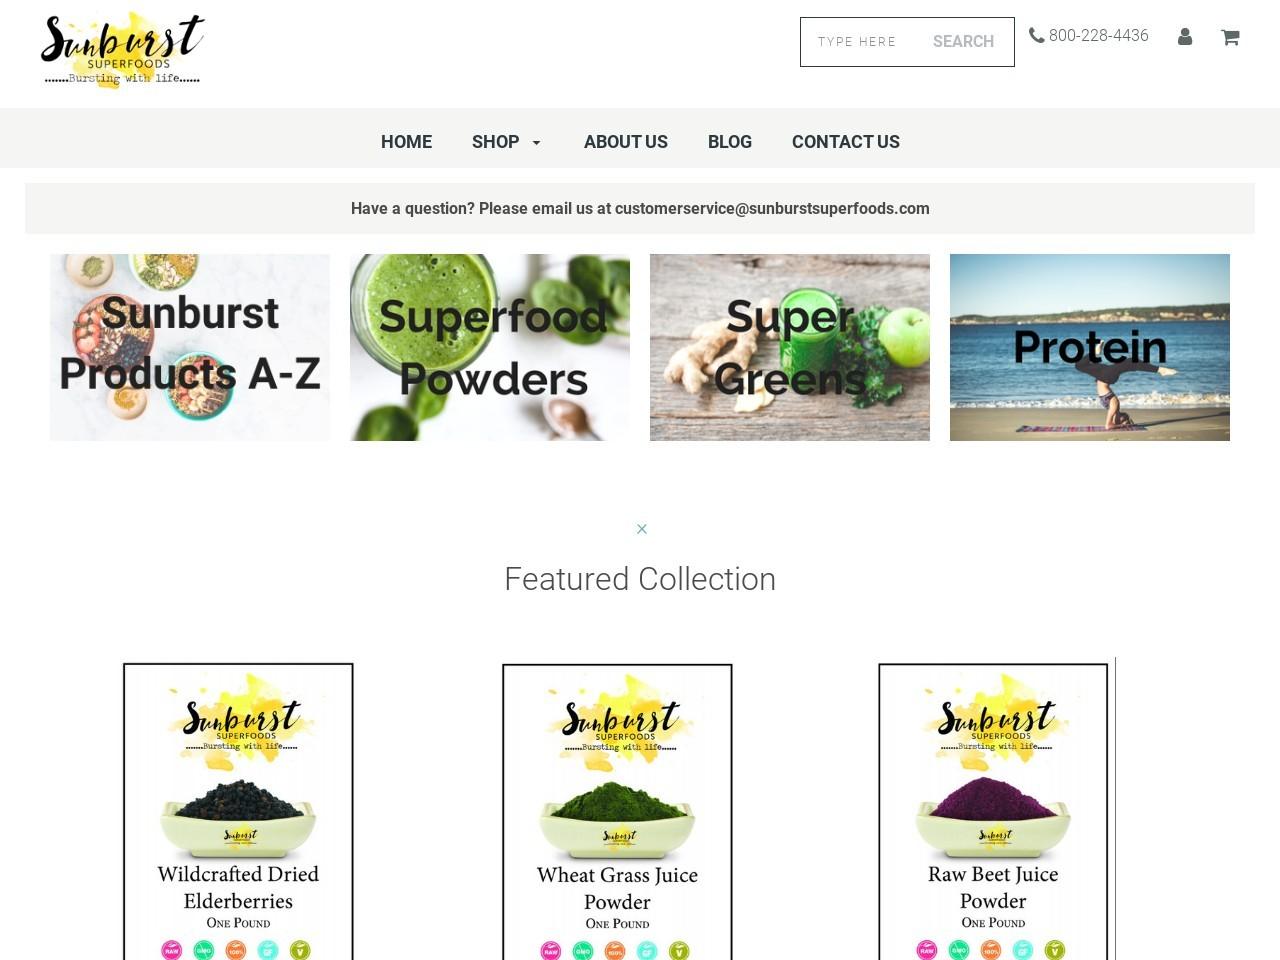 Sunburst Superfoods logo